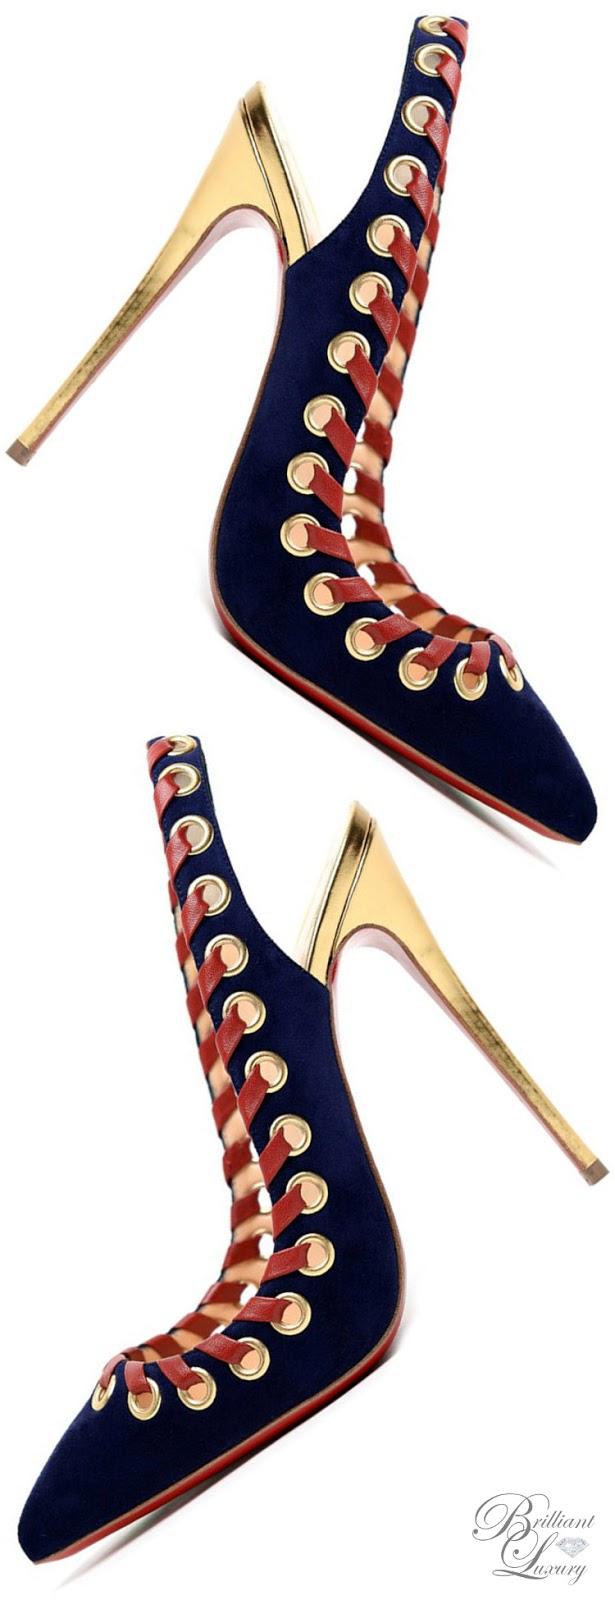 Brilliant Luxury ♦ Christian Louboutin Ostri Sling